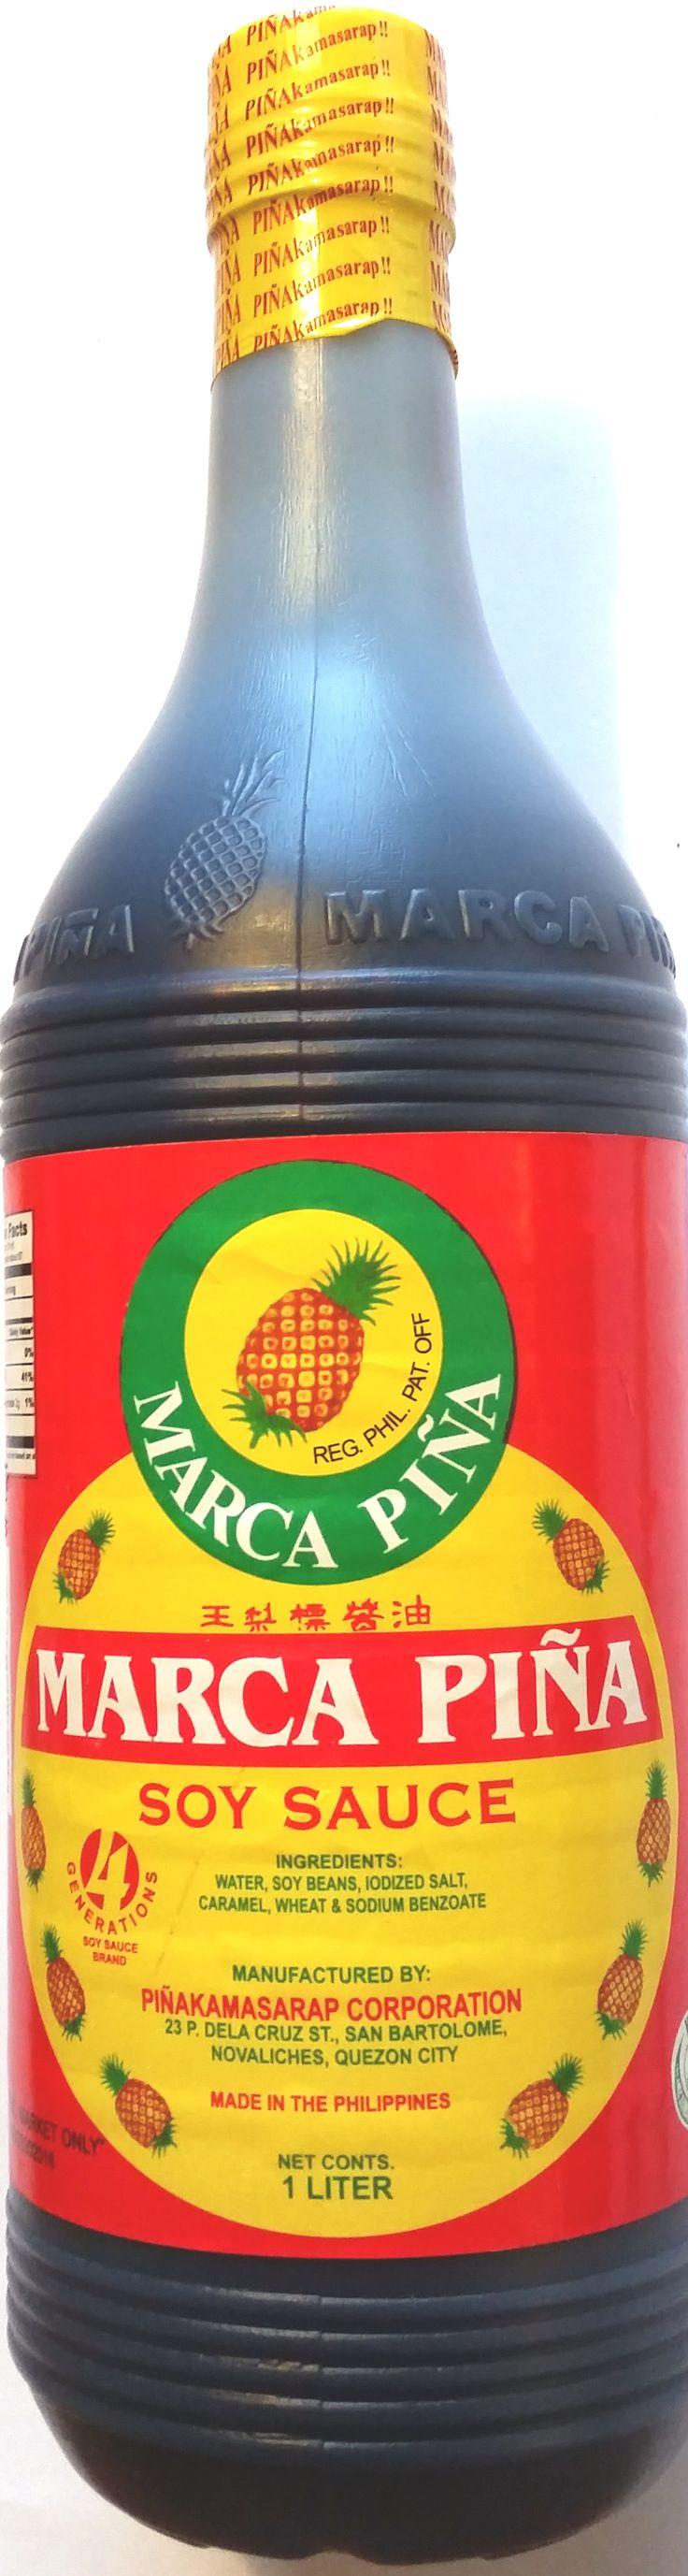 marca-pina-soy-sauce-1L